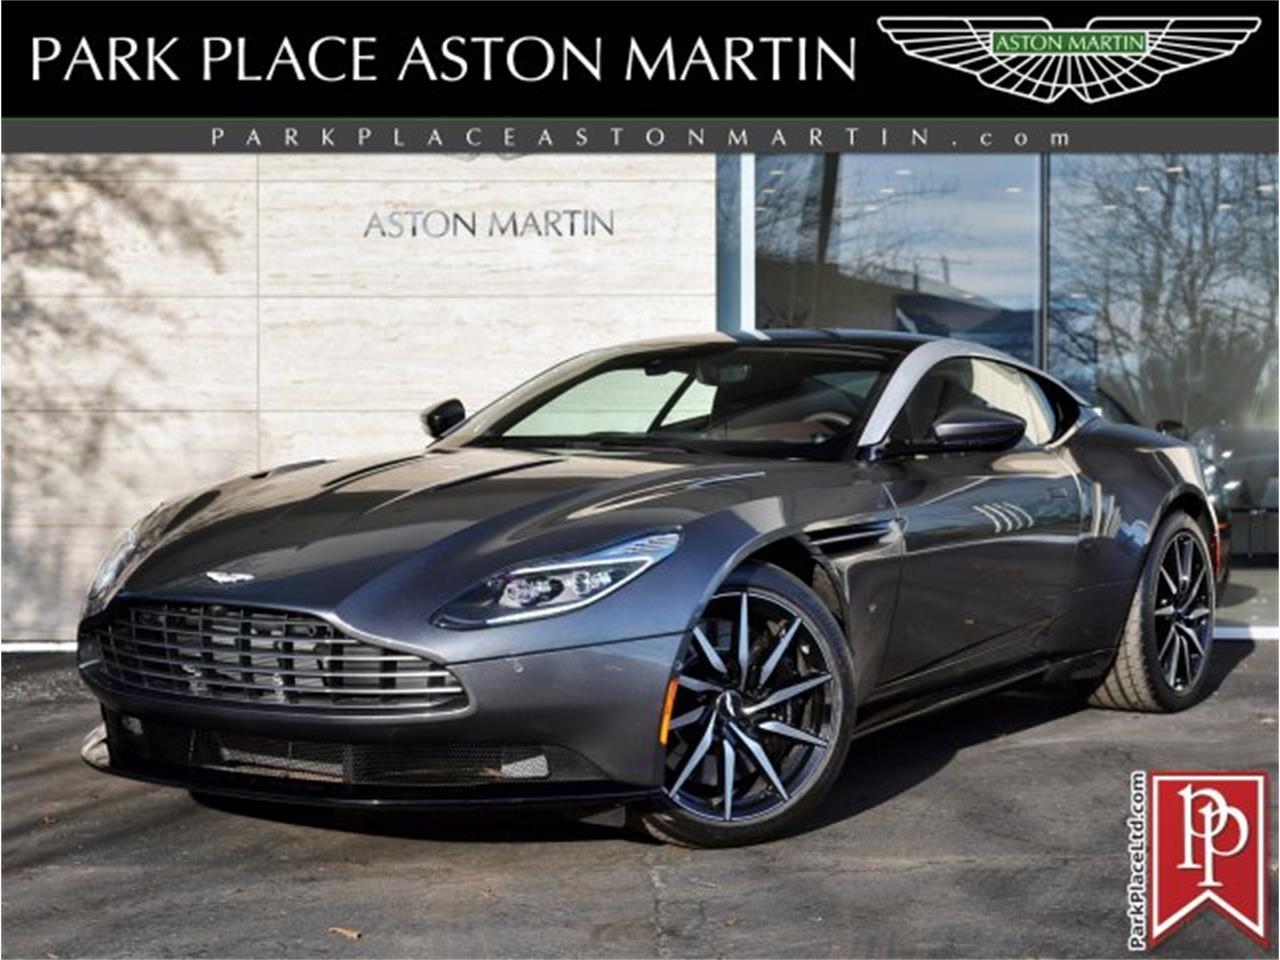 Aston Martin DB For Sale ClassicCarscom CC - 2018 aston martin v8 vantage for sale